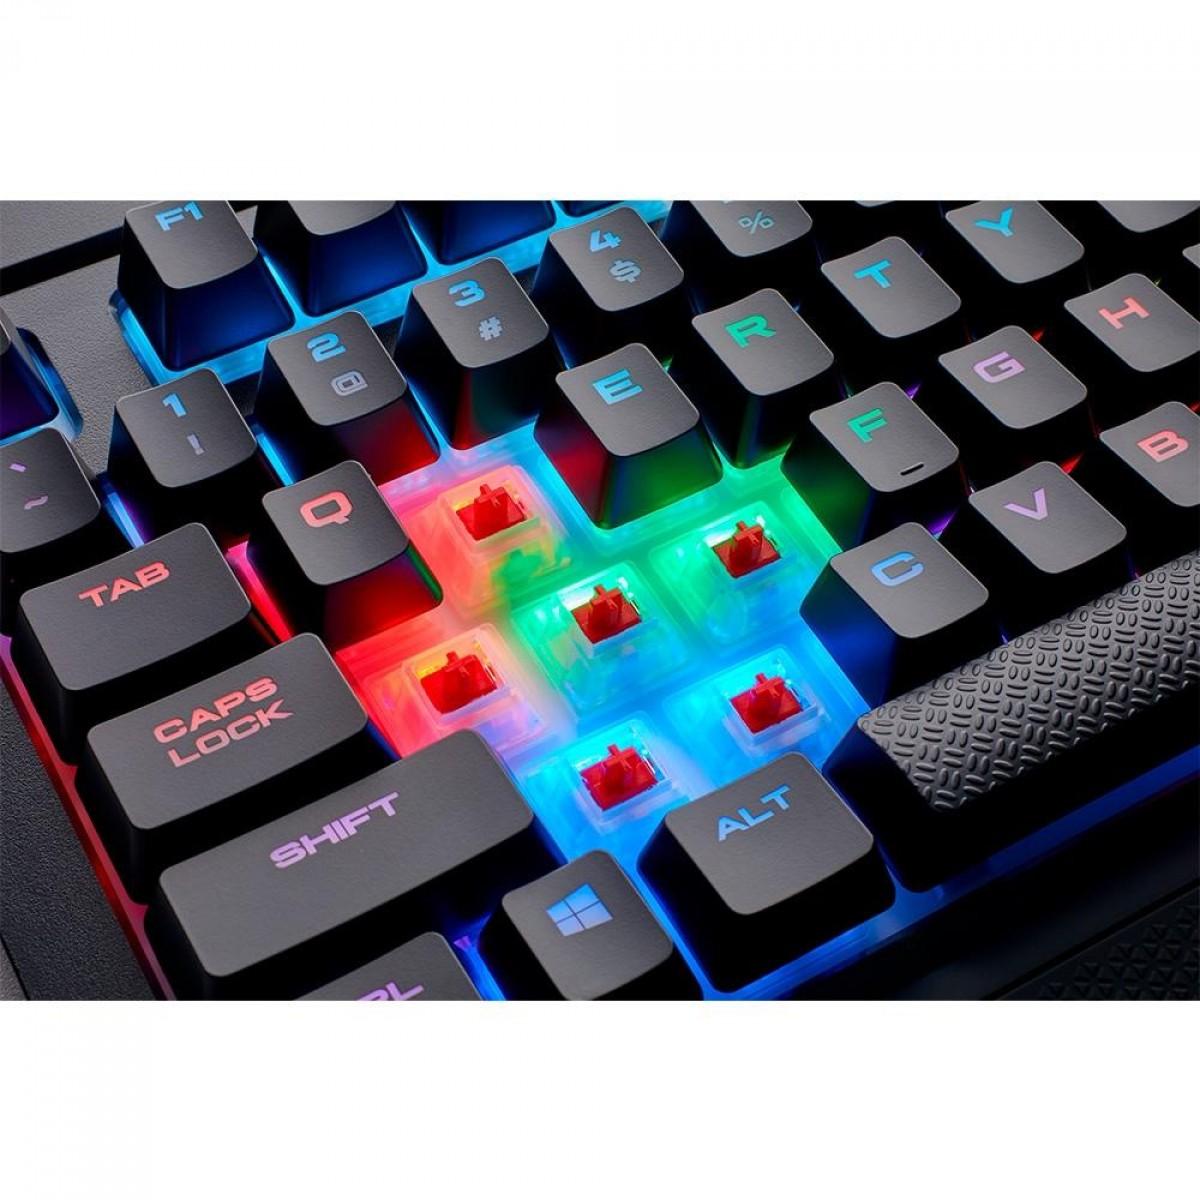 Teclado Mecanico Gamer Corsair Gaming K68 RGB Mechanical Keyboard, Backlitrgb LED, Cherry Mx Red, CH-9102010-BR (desativado - usar ID 9948)